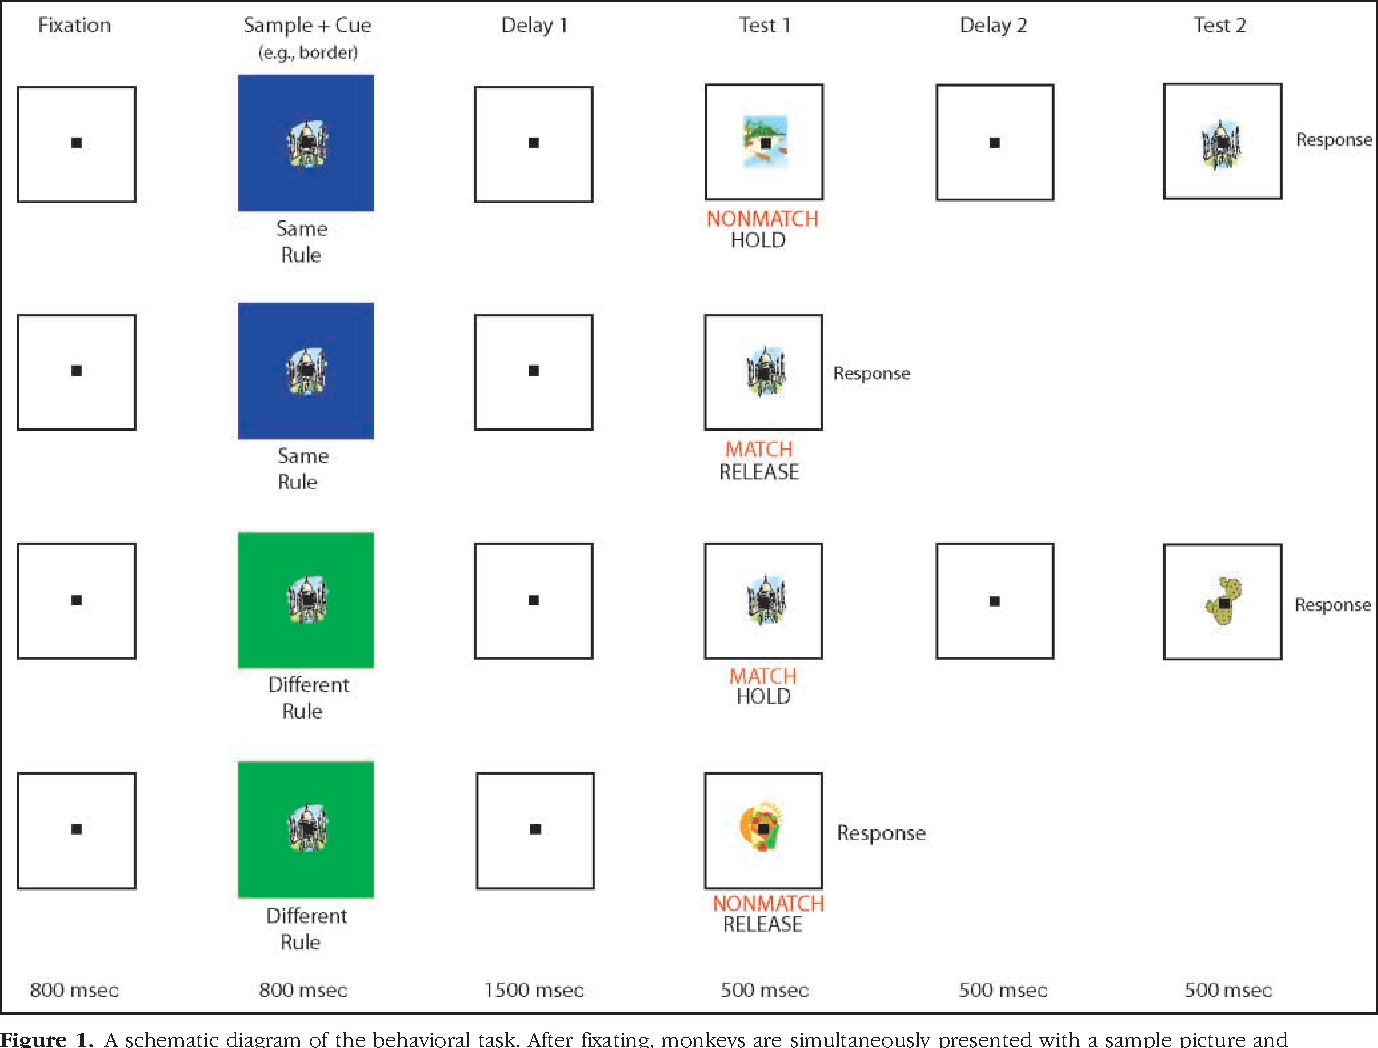 A Comparison Of Abstract Rules In The Prefrontal Cortex Premotor Circuit Diagram Figure 1